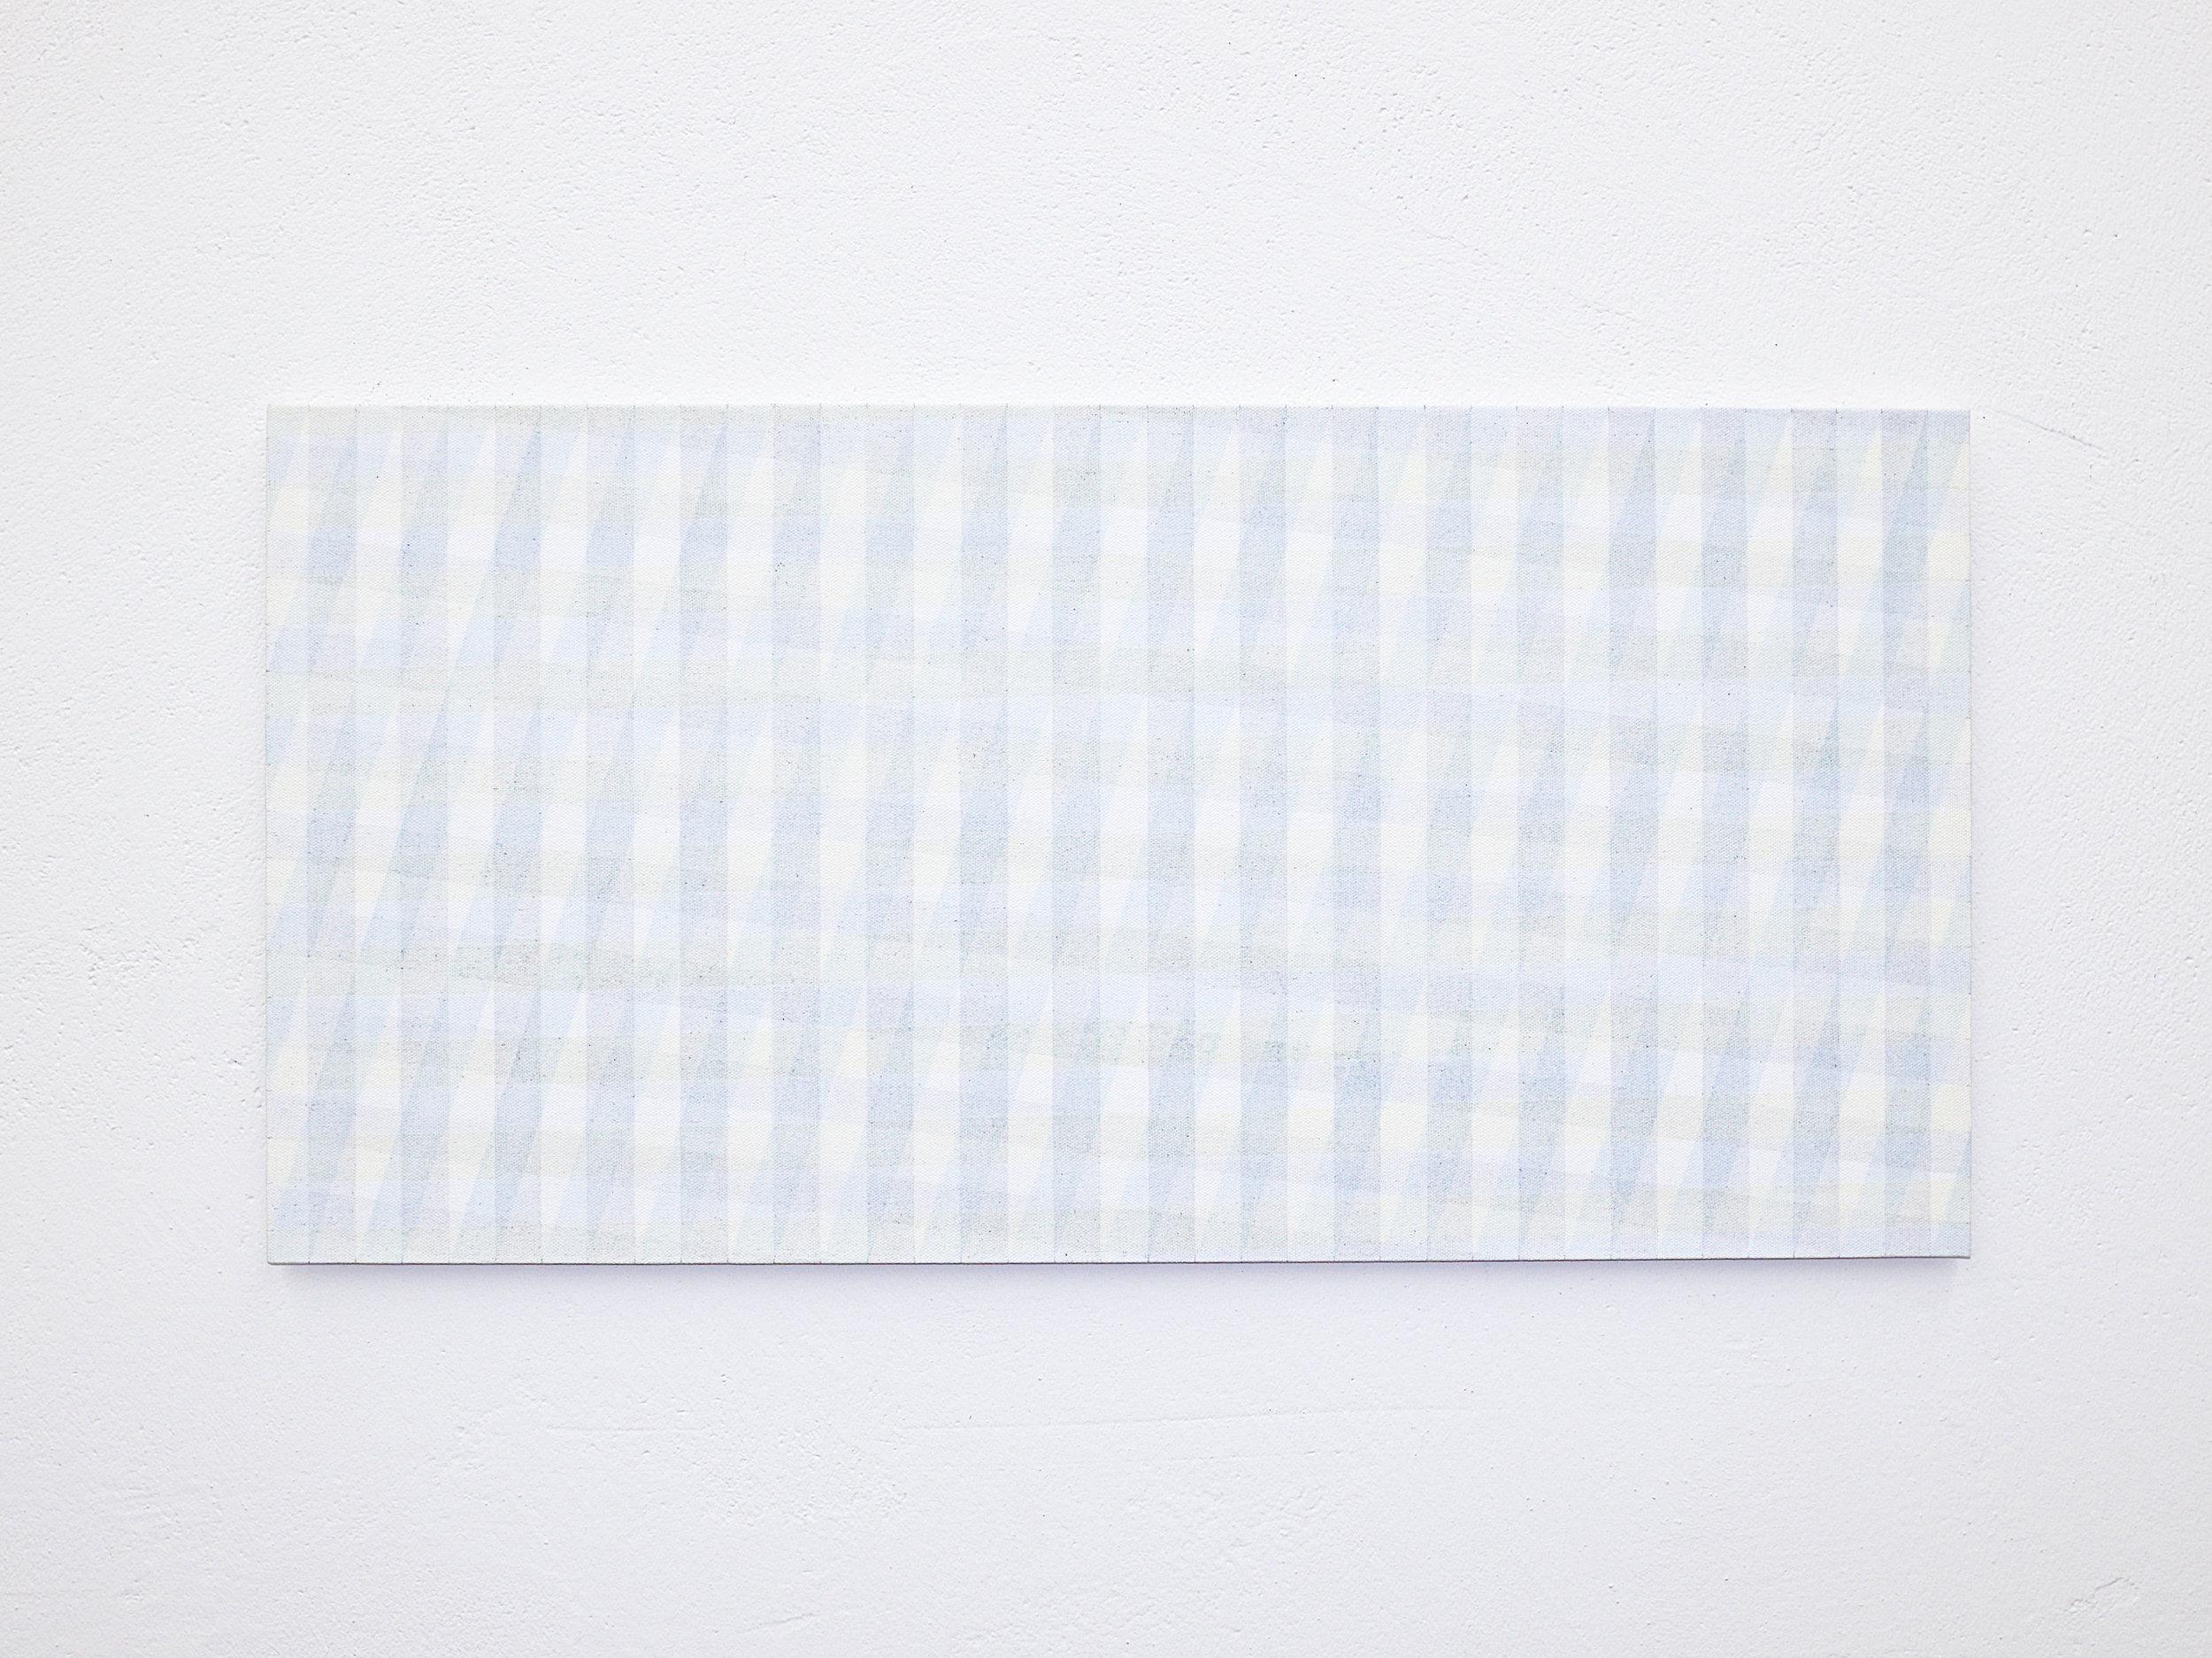 bild nr. 04/2019 - 35 x 70cm - acryl auf baumwolle/alu